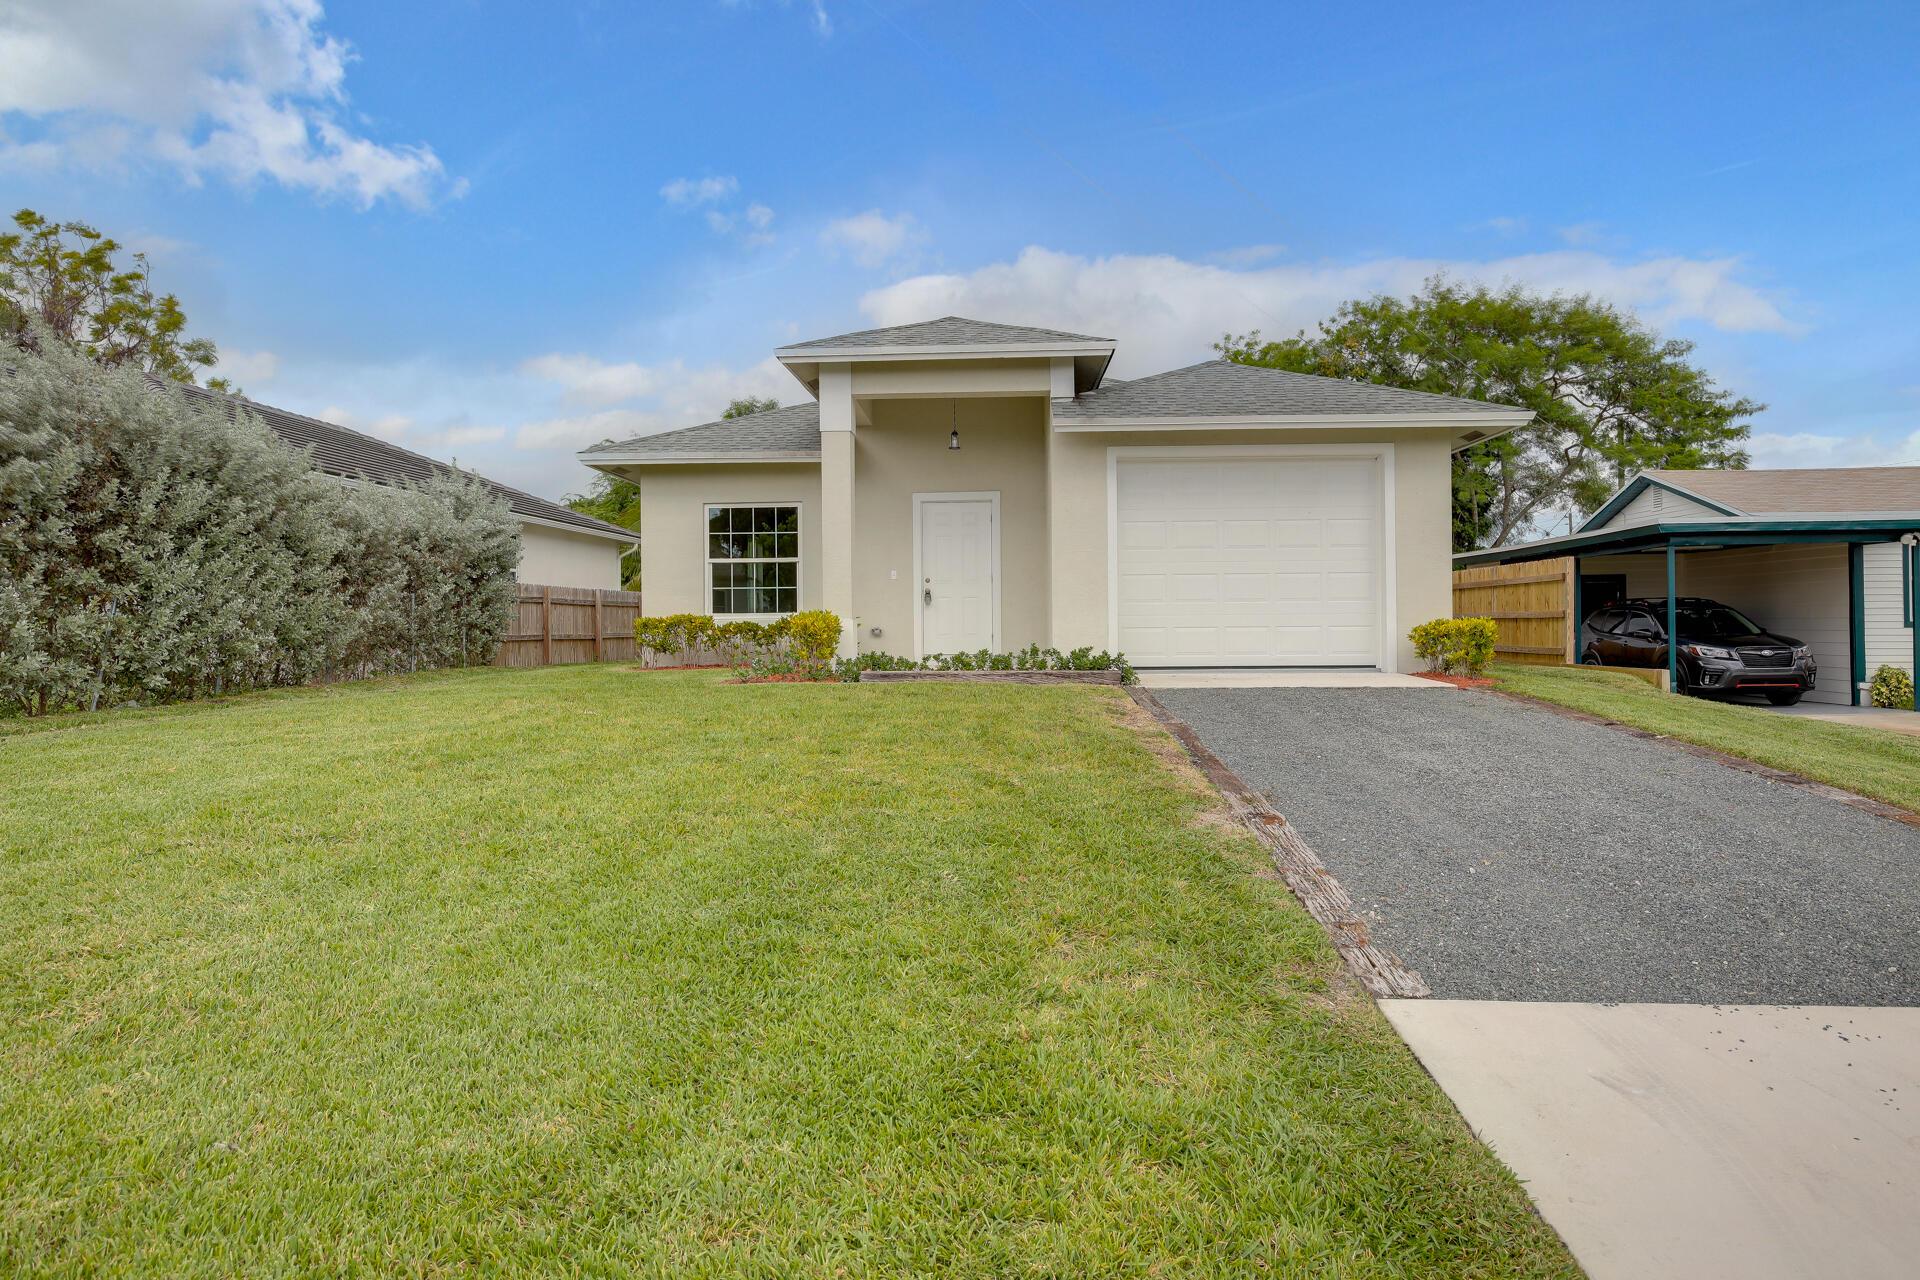 86  Ethelyn Drive  For Sale 10749302, FL